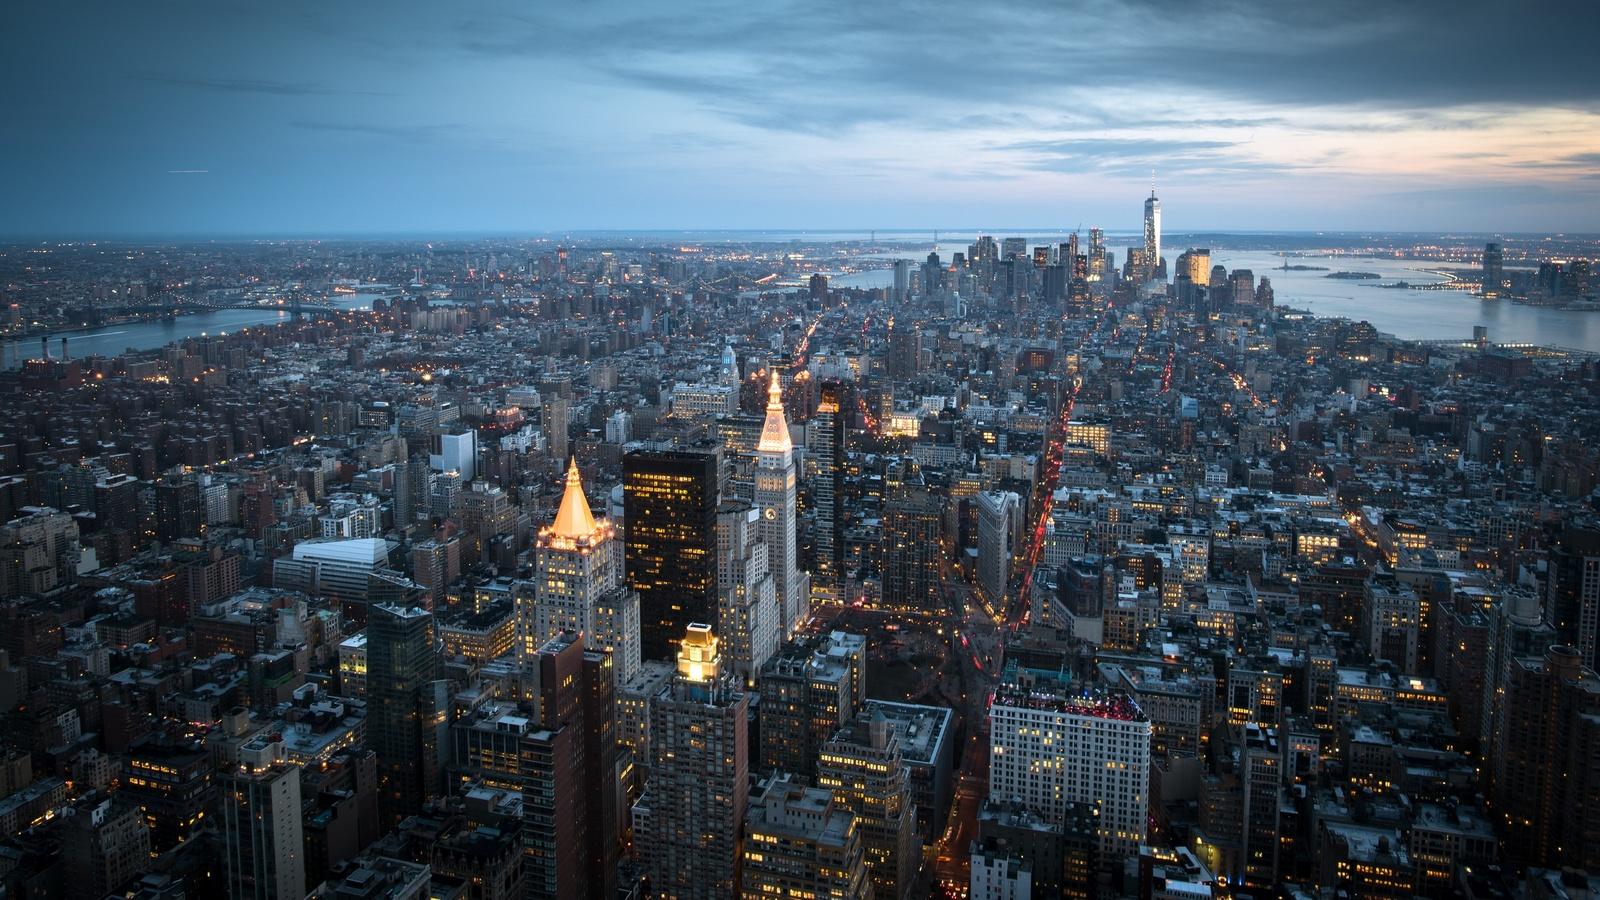 manhattan, new york, city, город, вечер, небоскрёбы, огни